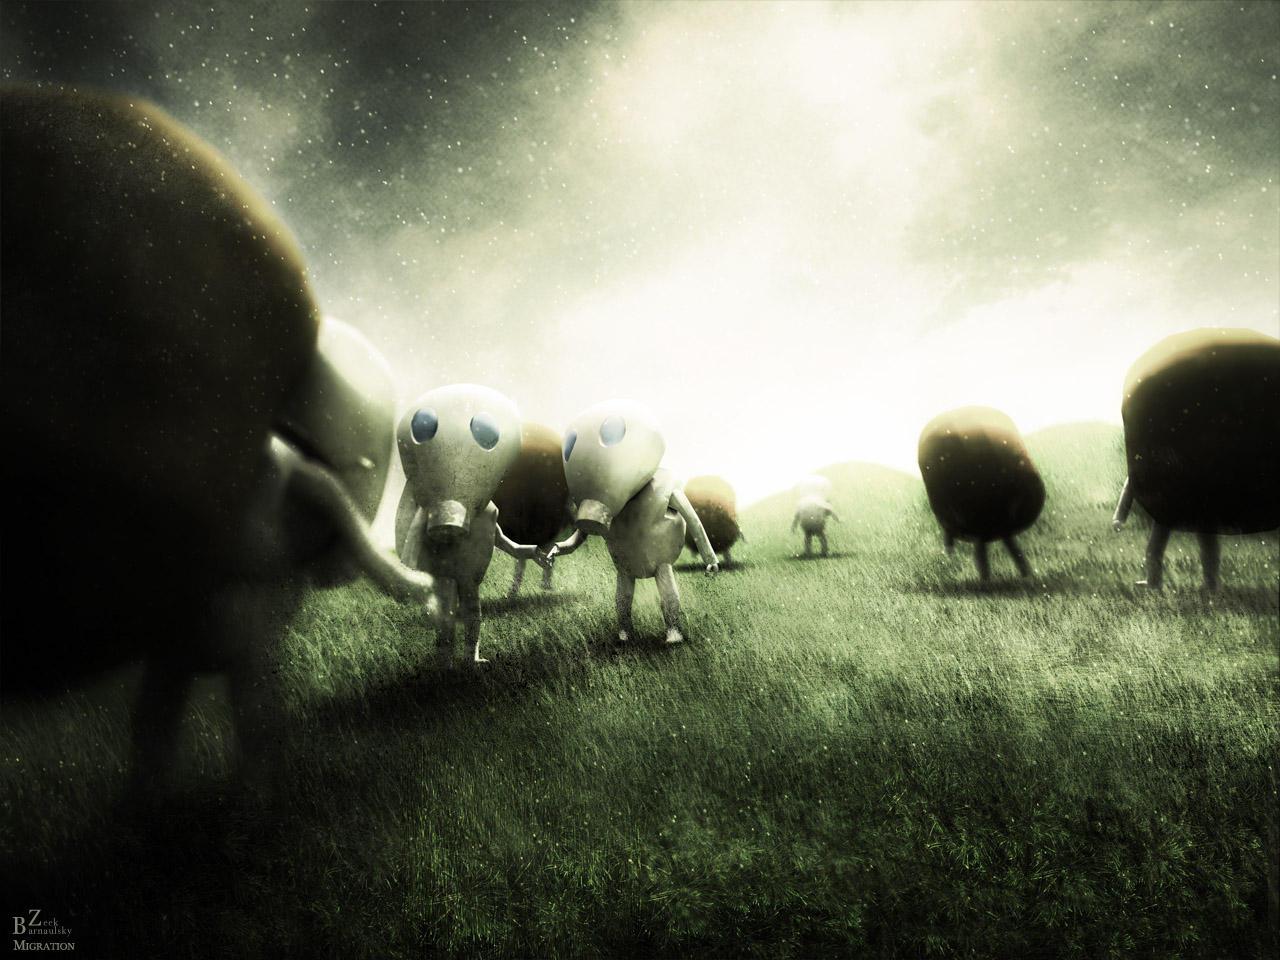 Migration by barnaulsky-zeek